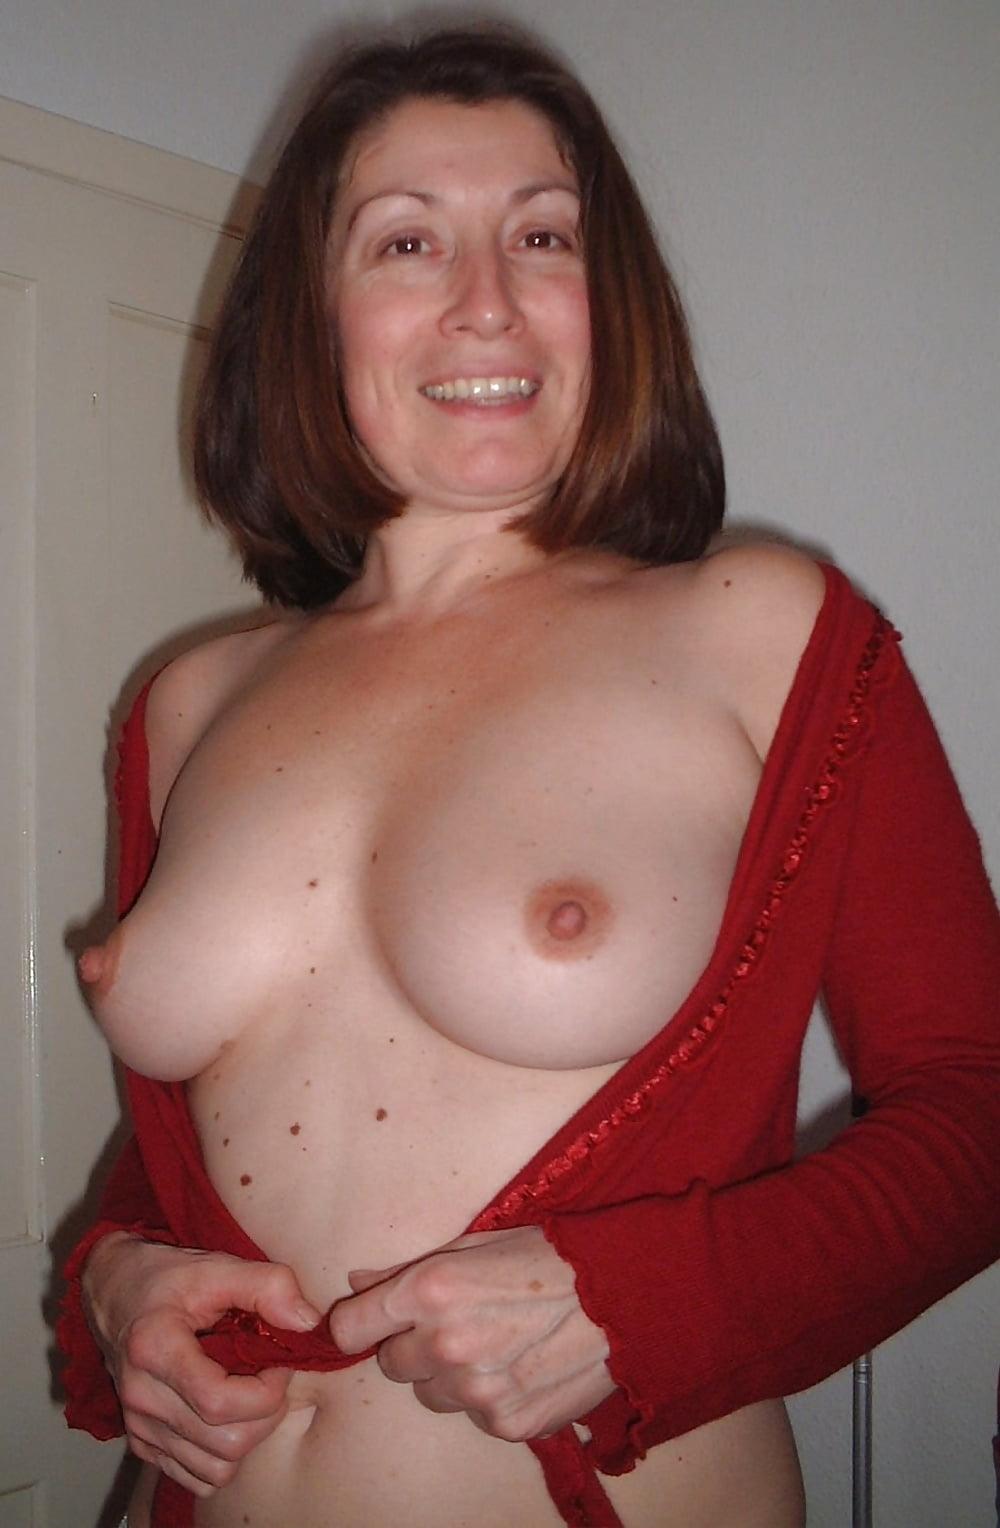 Self naked amatuer milf hard nipples nude outside gianna